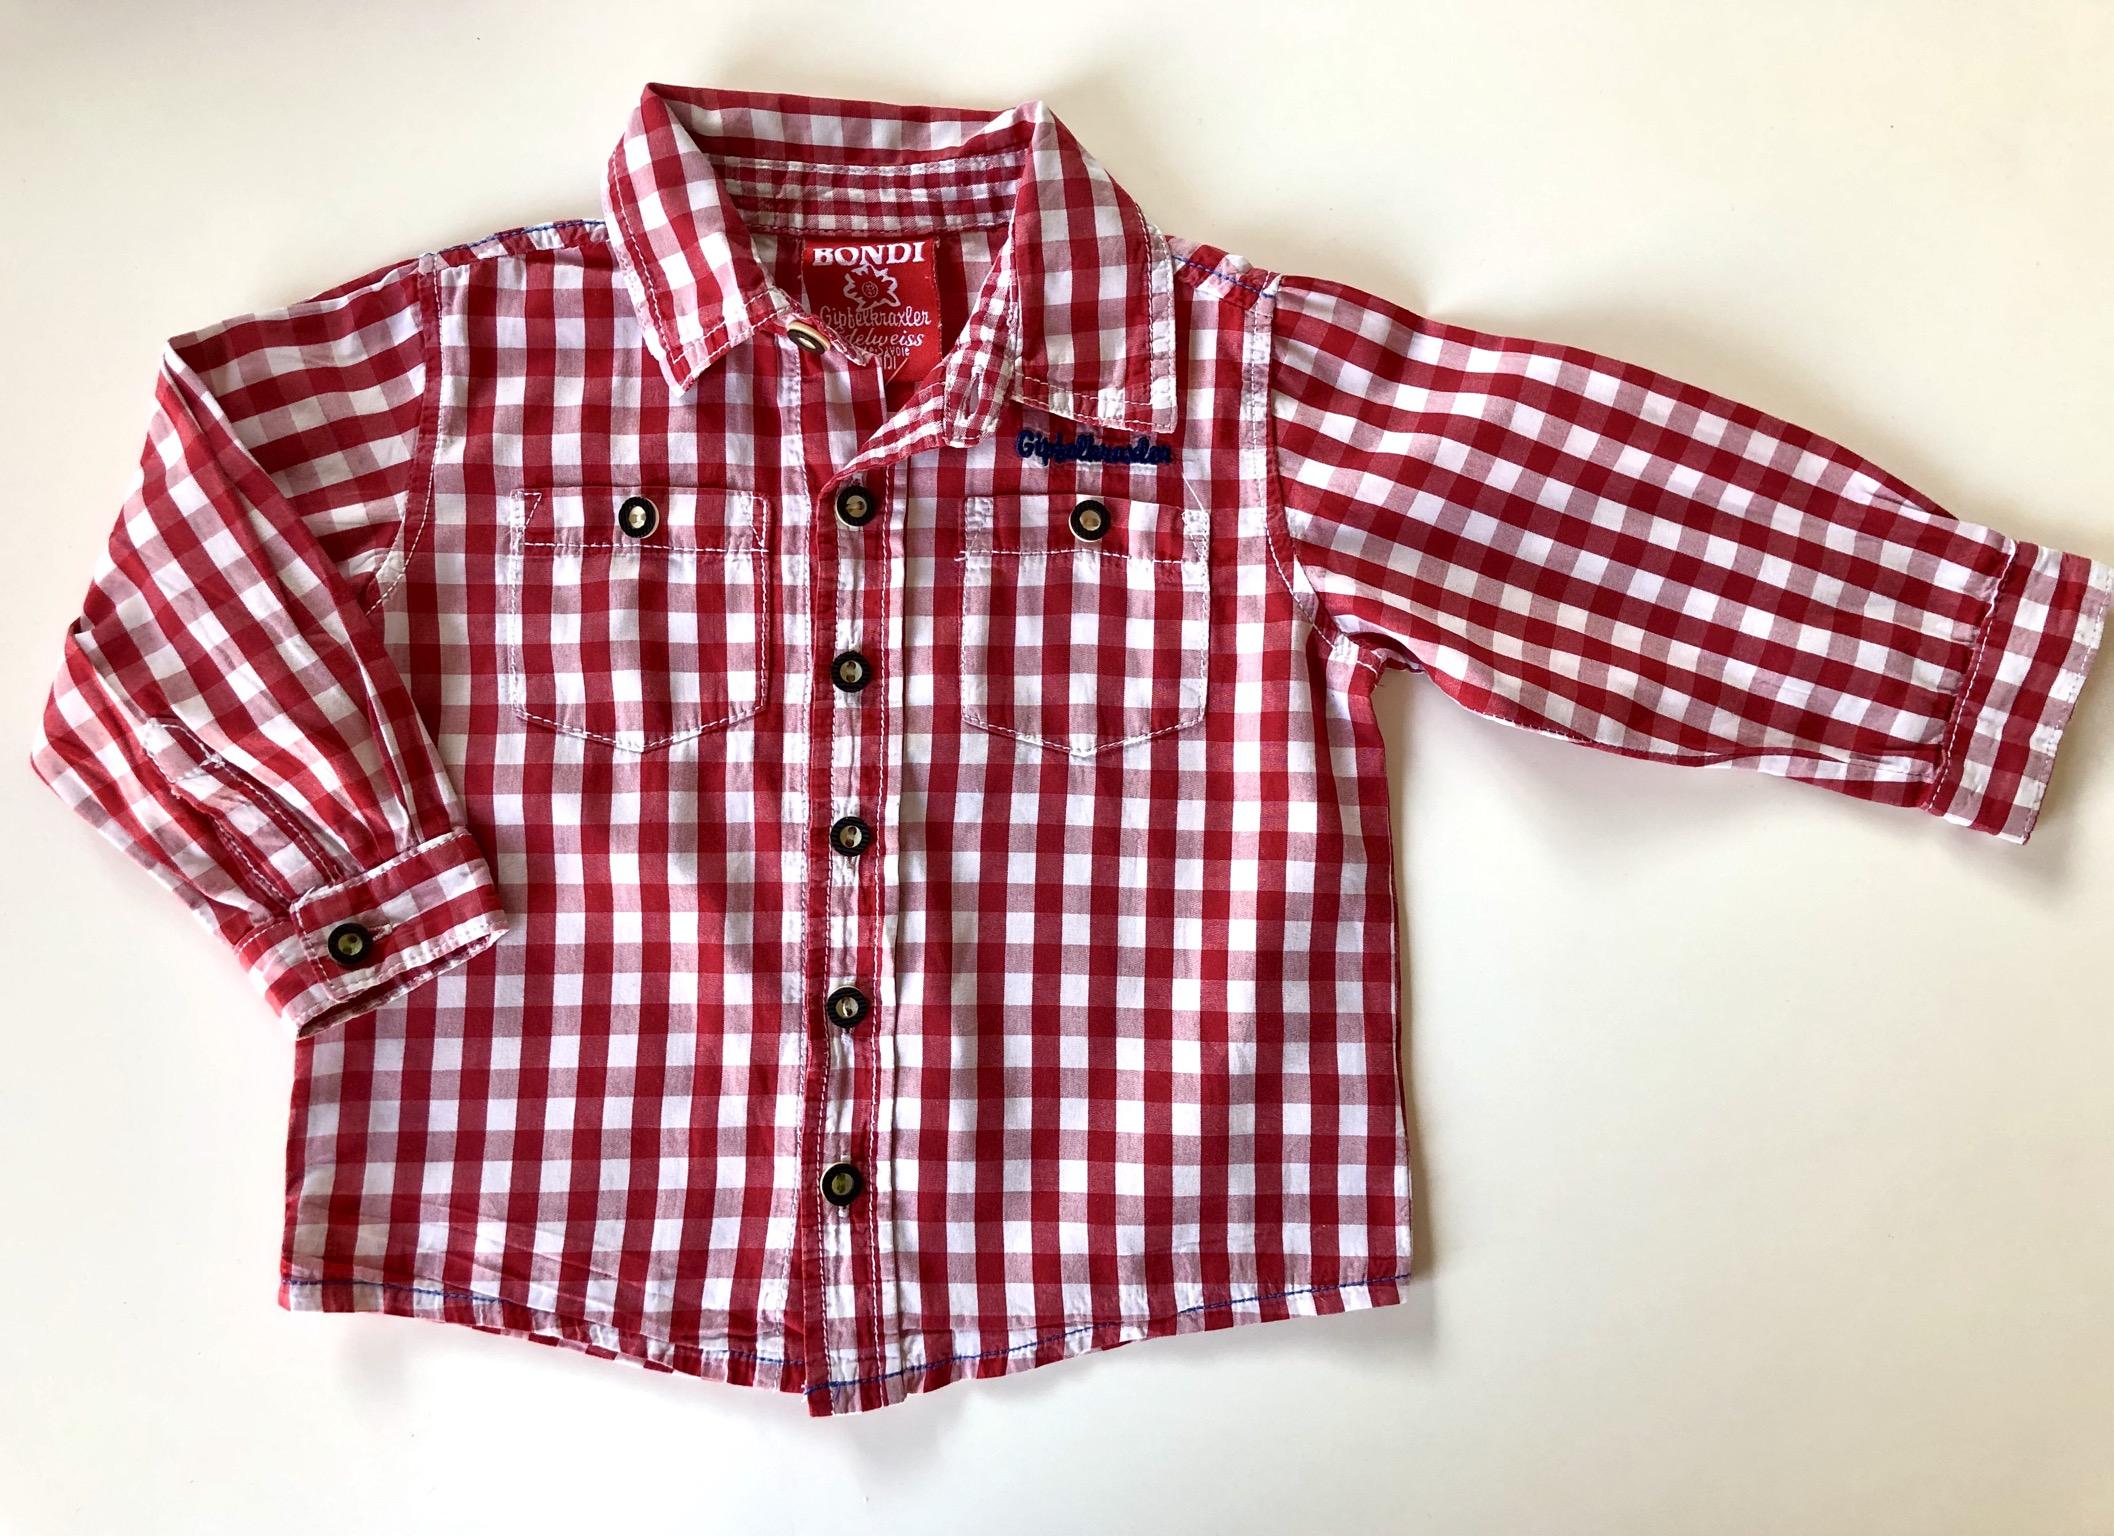 Gr. 80 Bondi Alpenglück Trachtenhemd rot